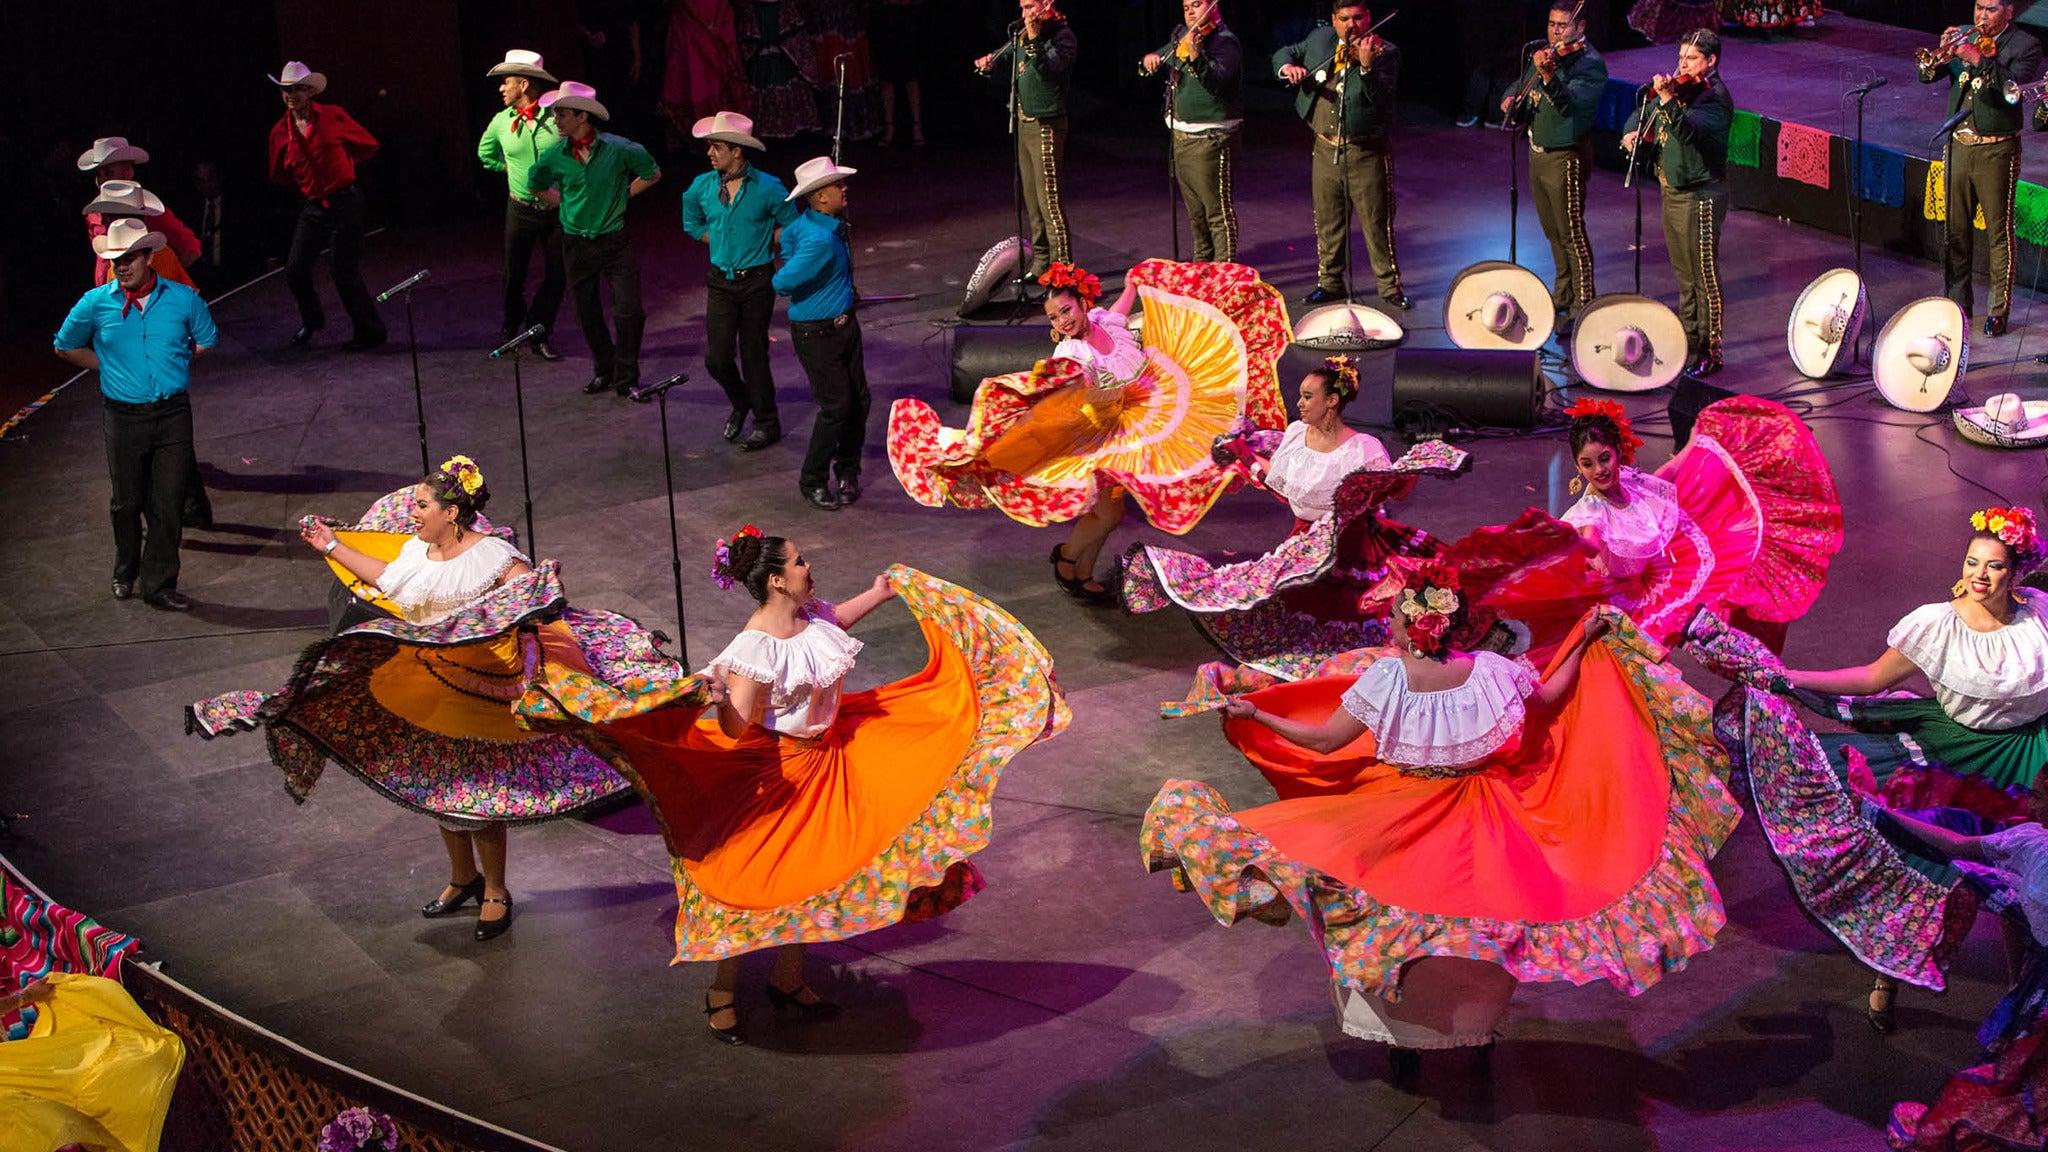 presale code for CCA & C.A.L.L.E. De Arizona Present The Mariachi & Folklorico Festival tickets in Chandler - AZ (Chandler Center for the Arts)